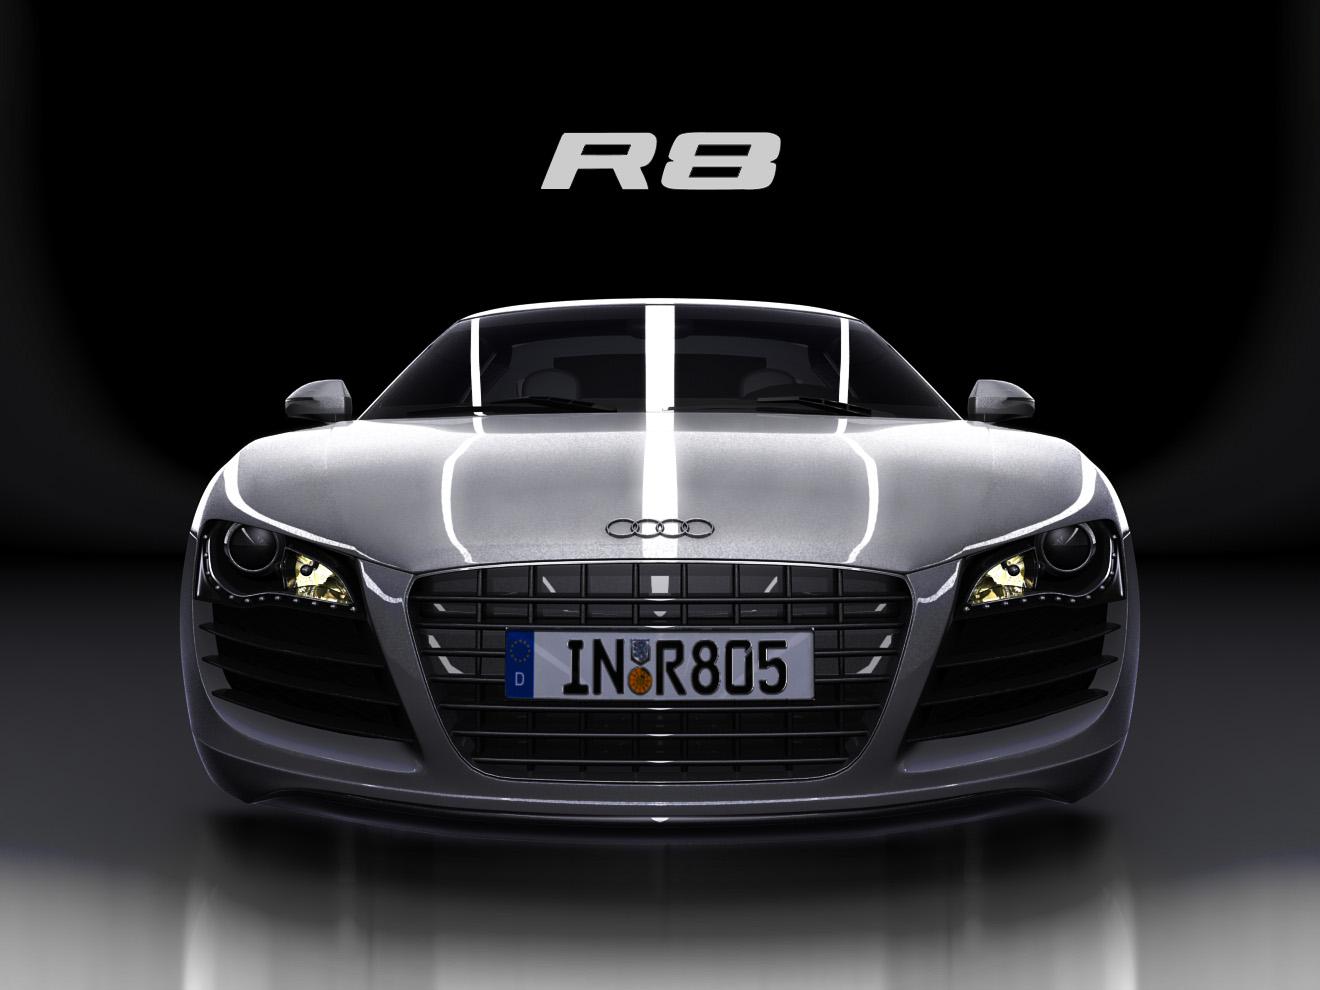 Free Download Image Of Audi R8